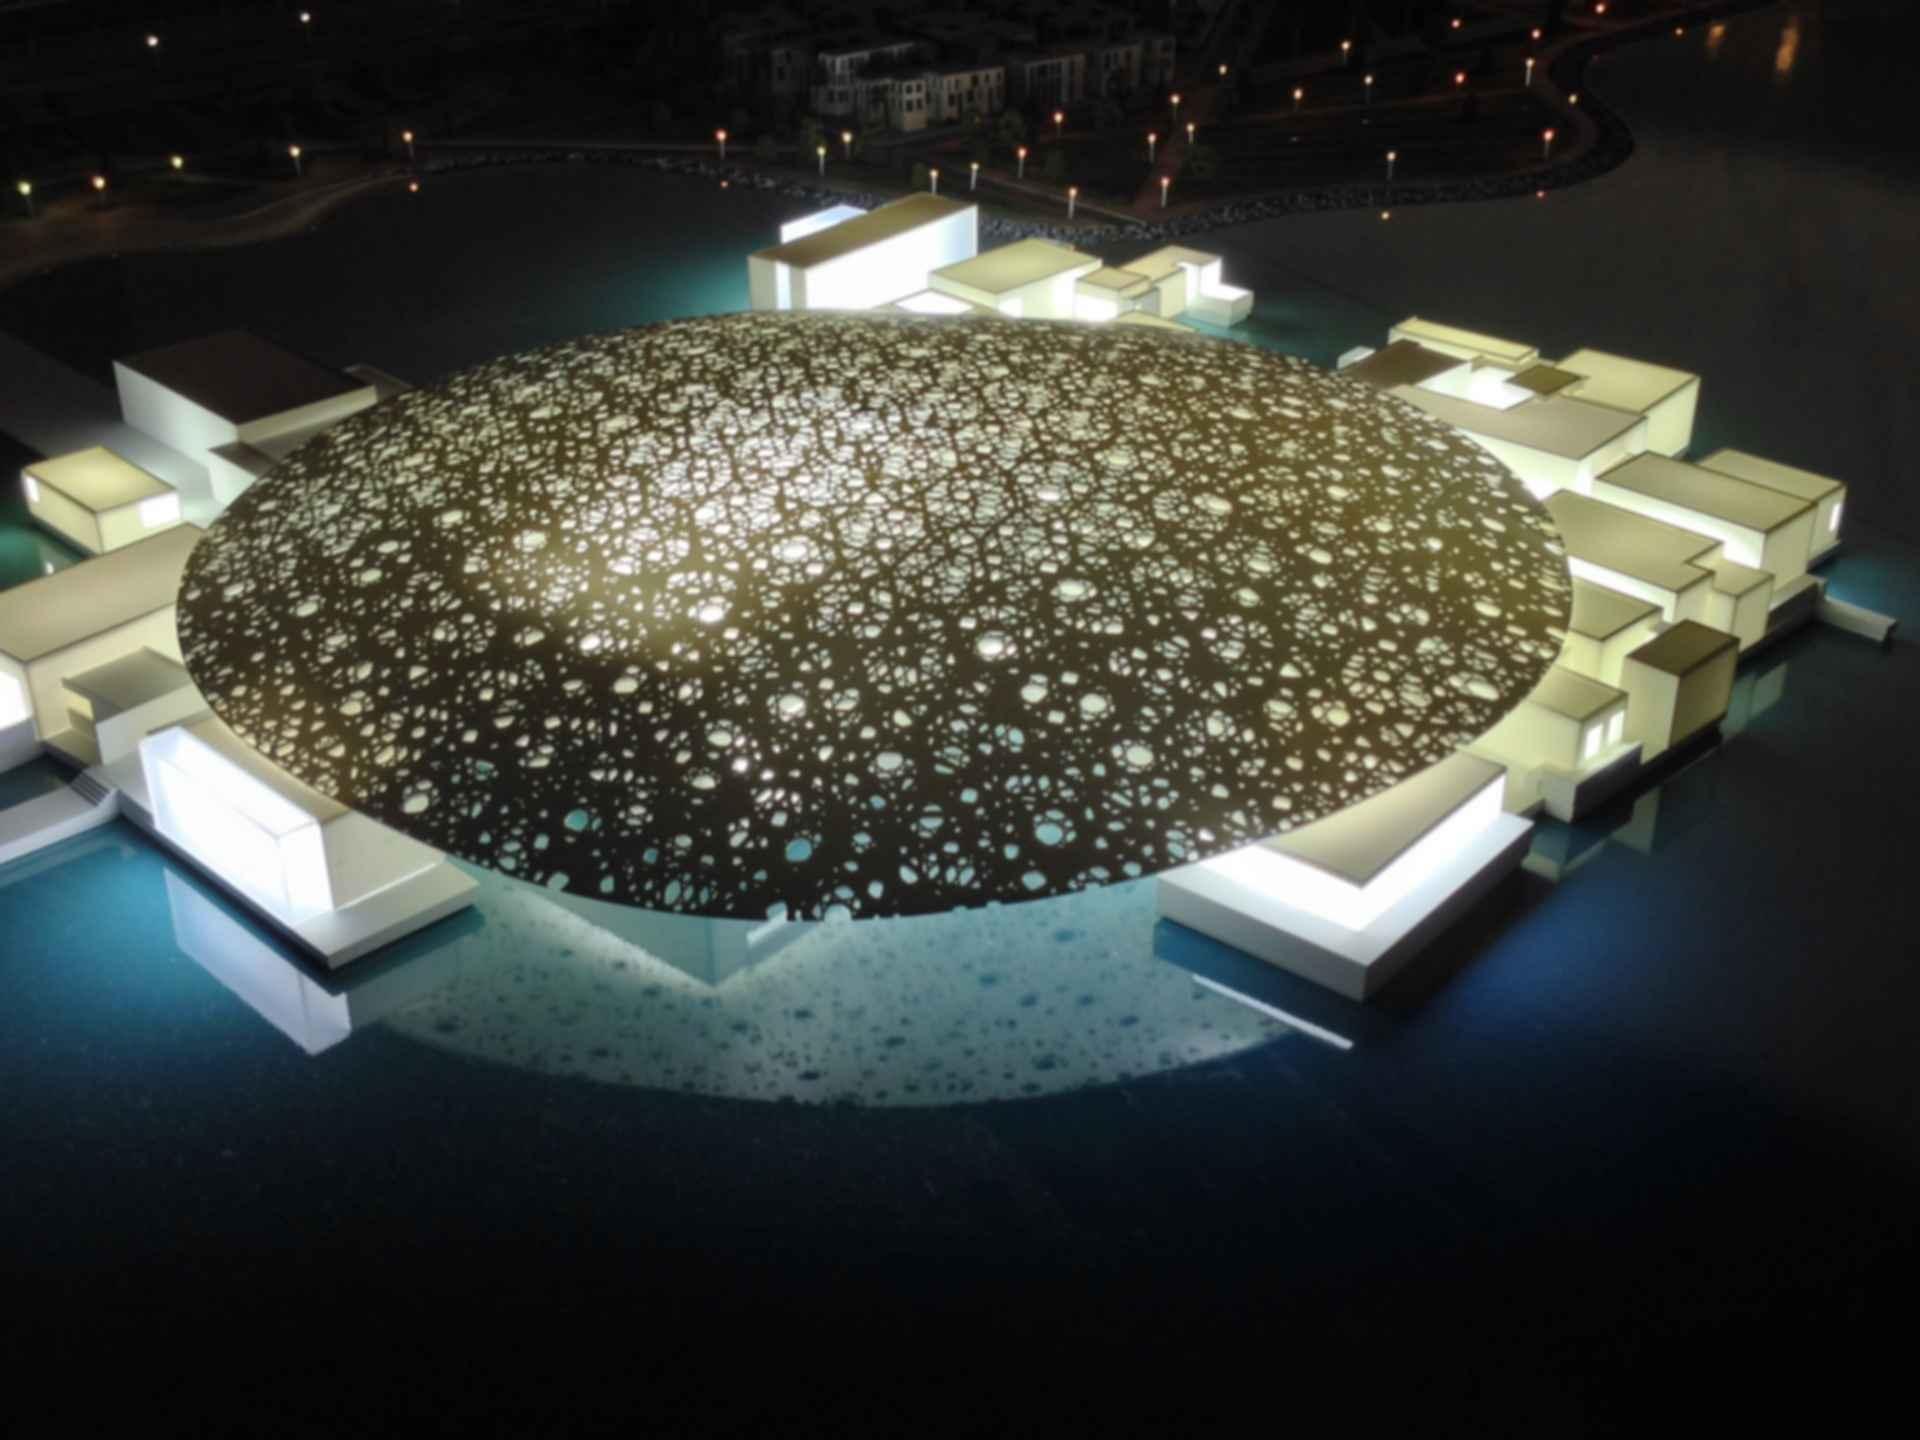 Louvre Abu Dhabi - Exterior Concept